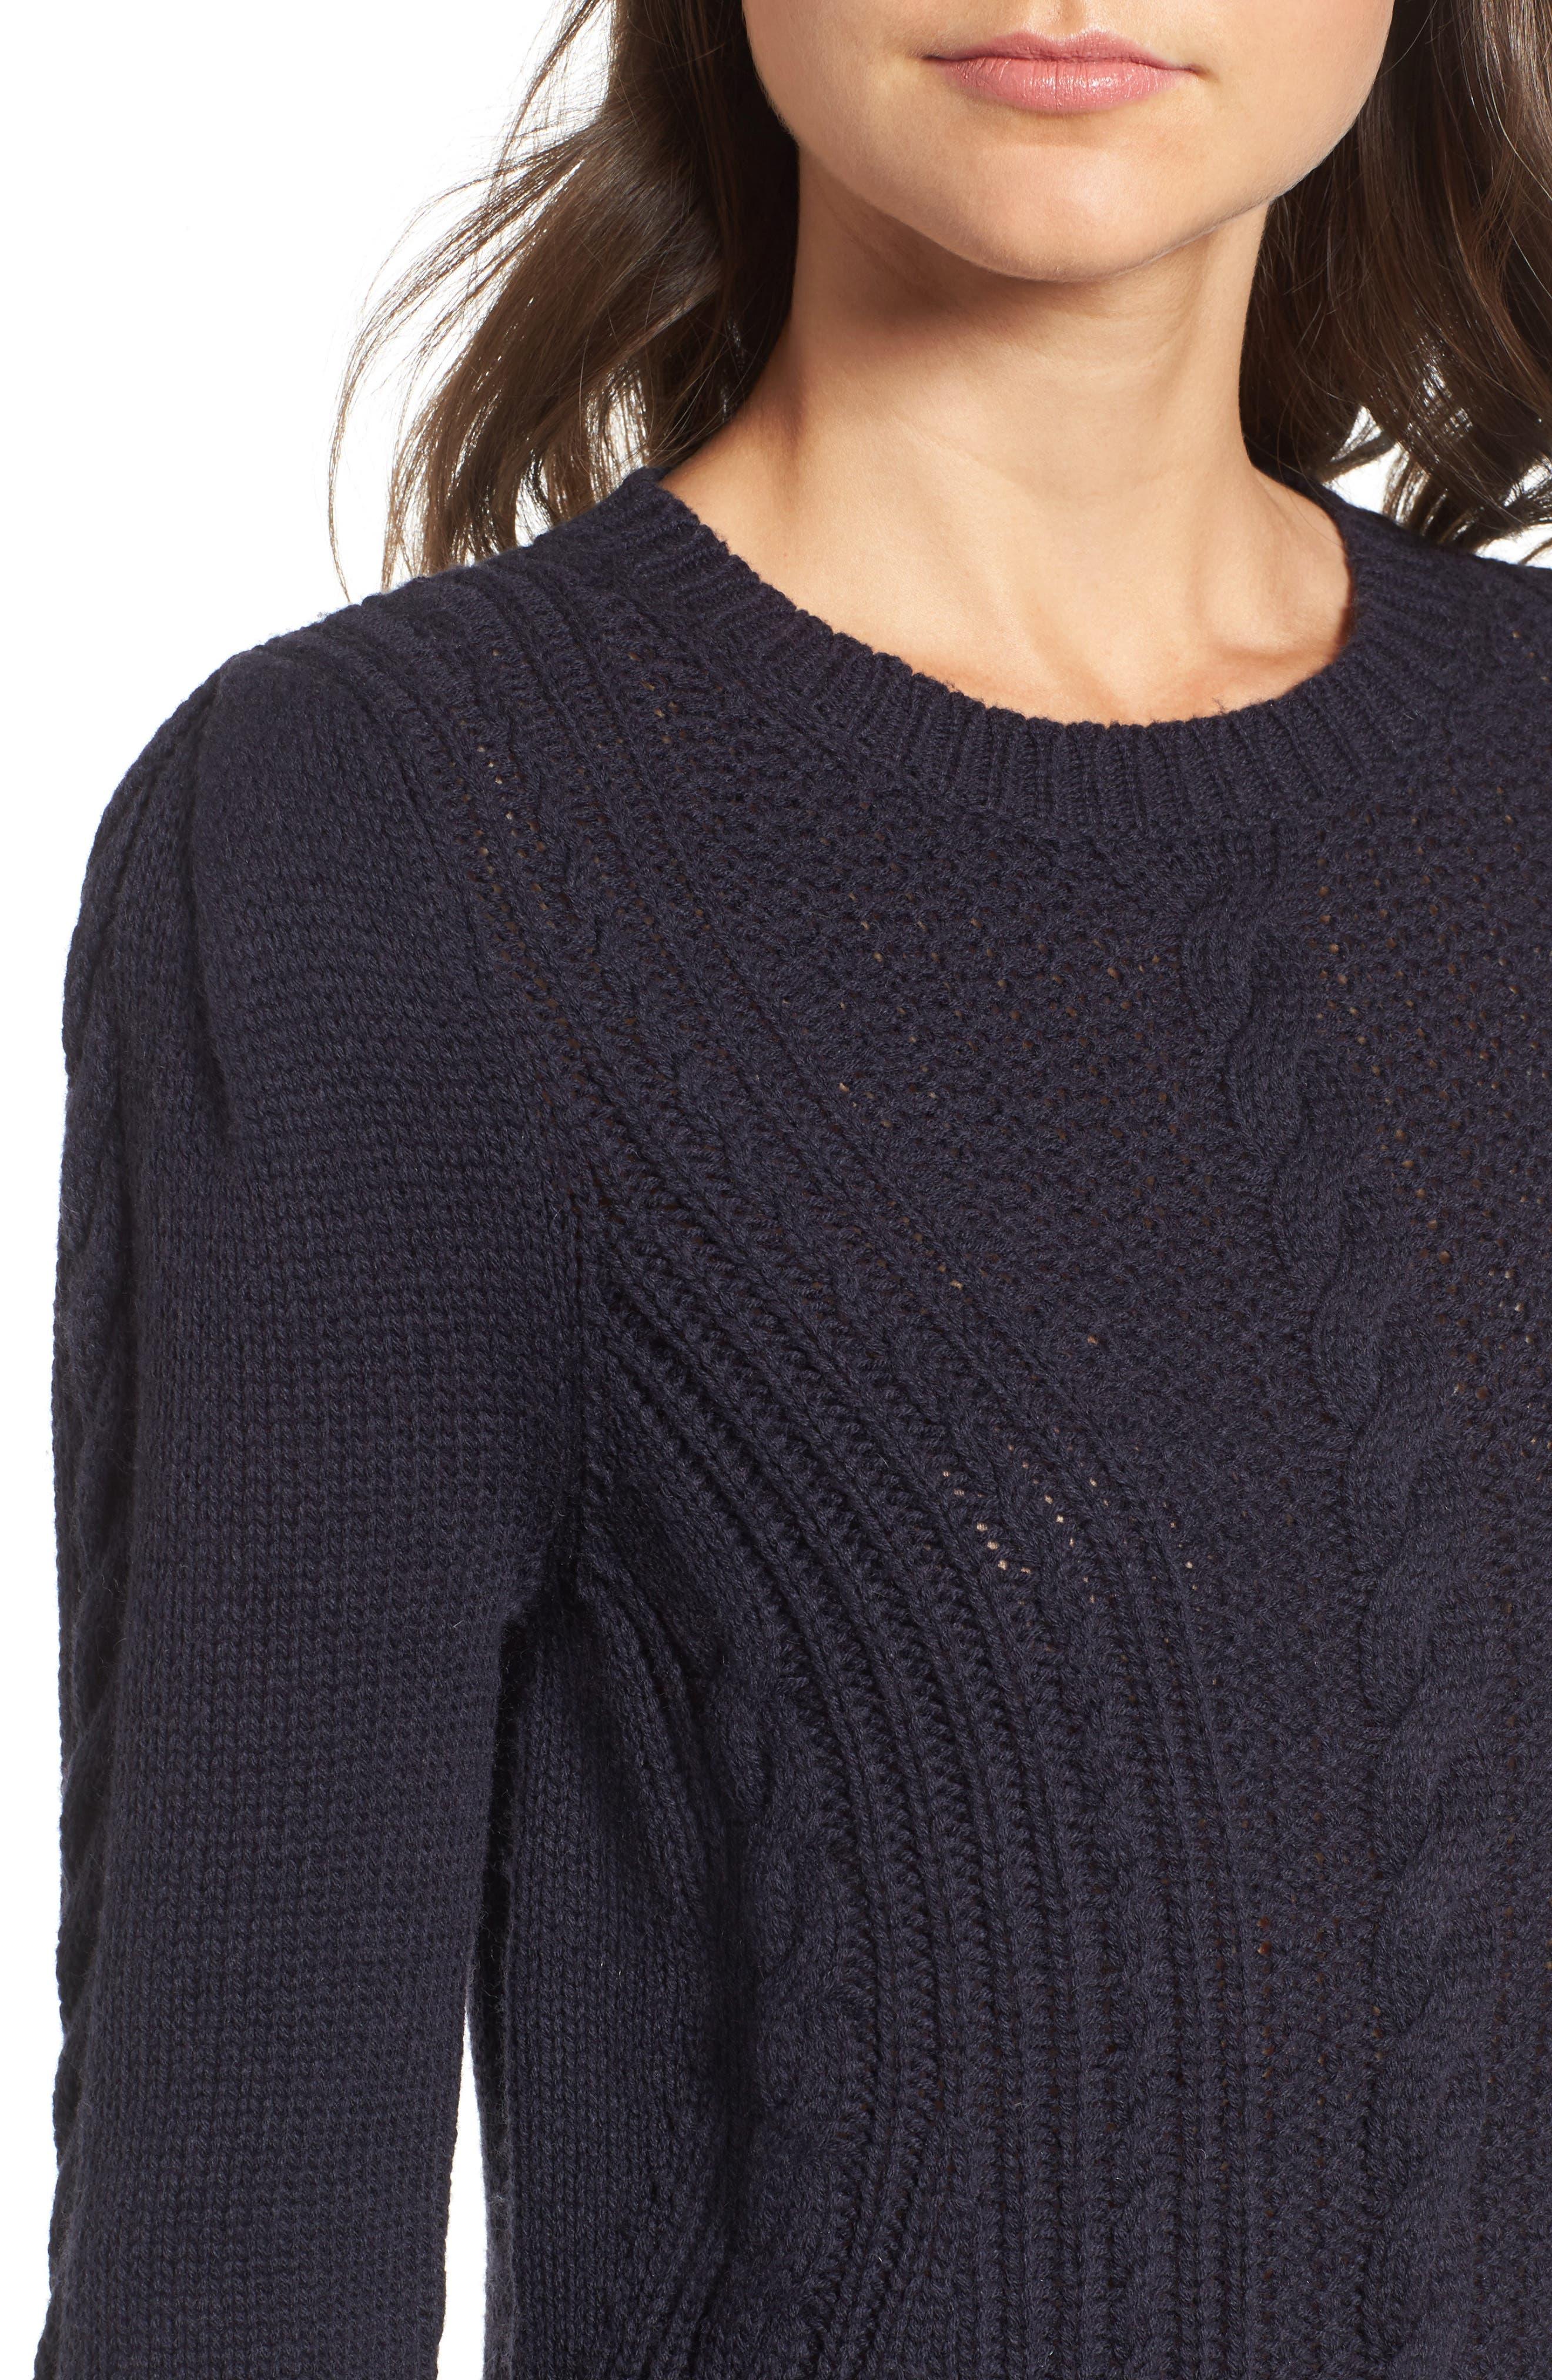 x Something Navy Sweater Dress,                             Alternate thumbnail 5, color,                             Navy Night